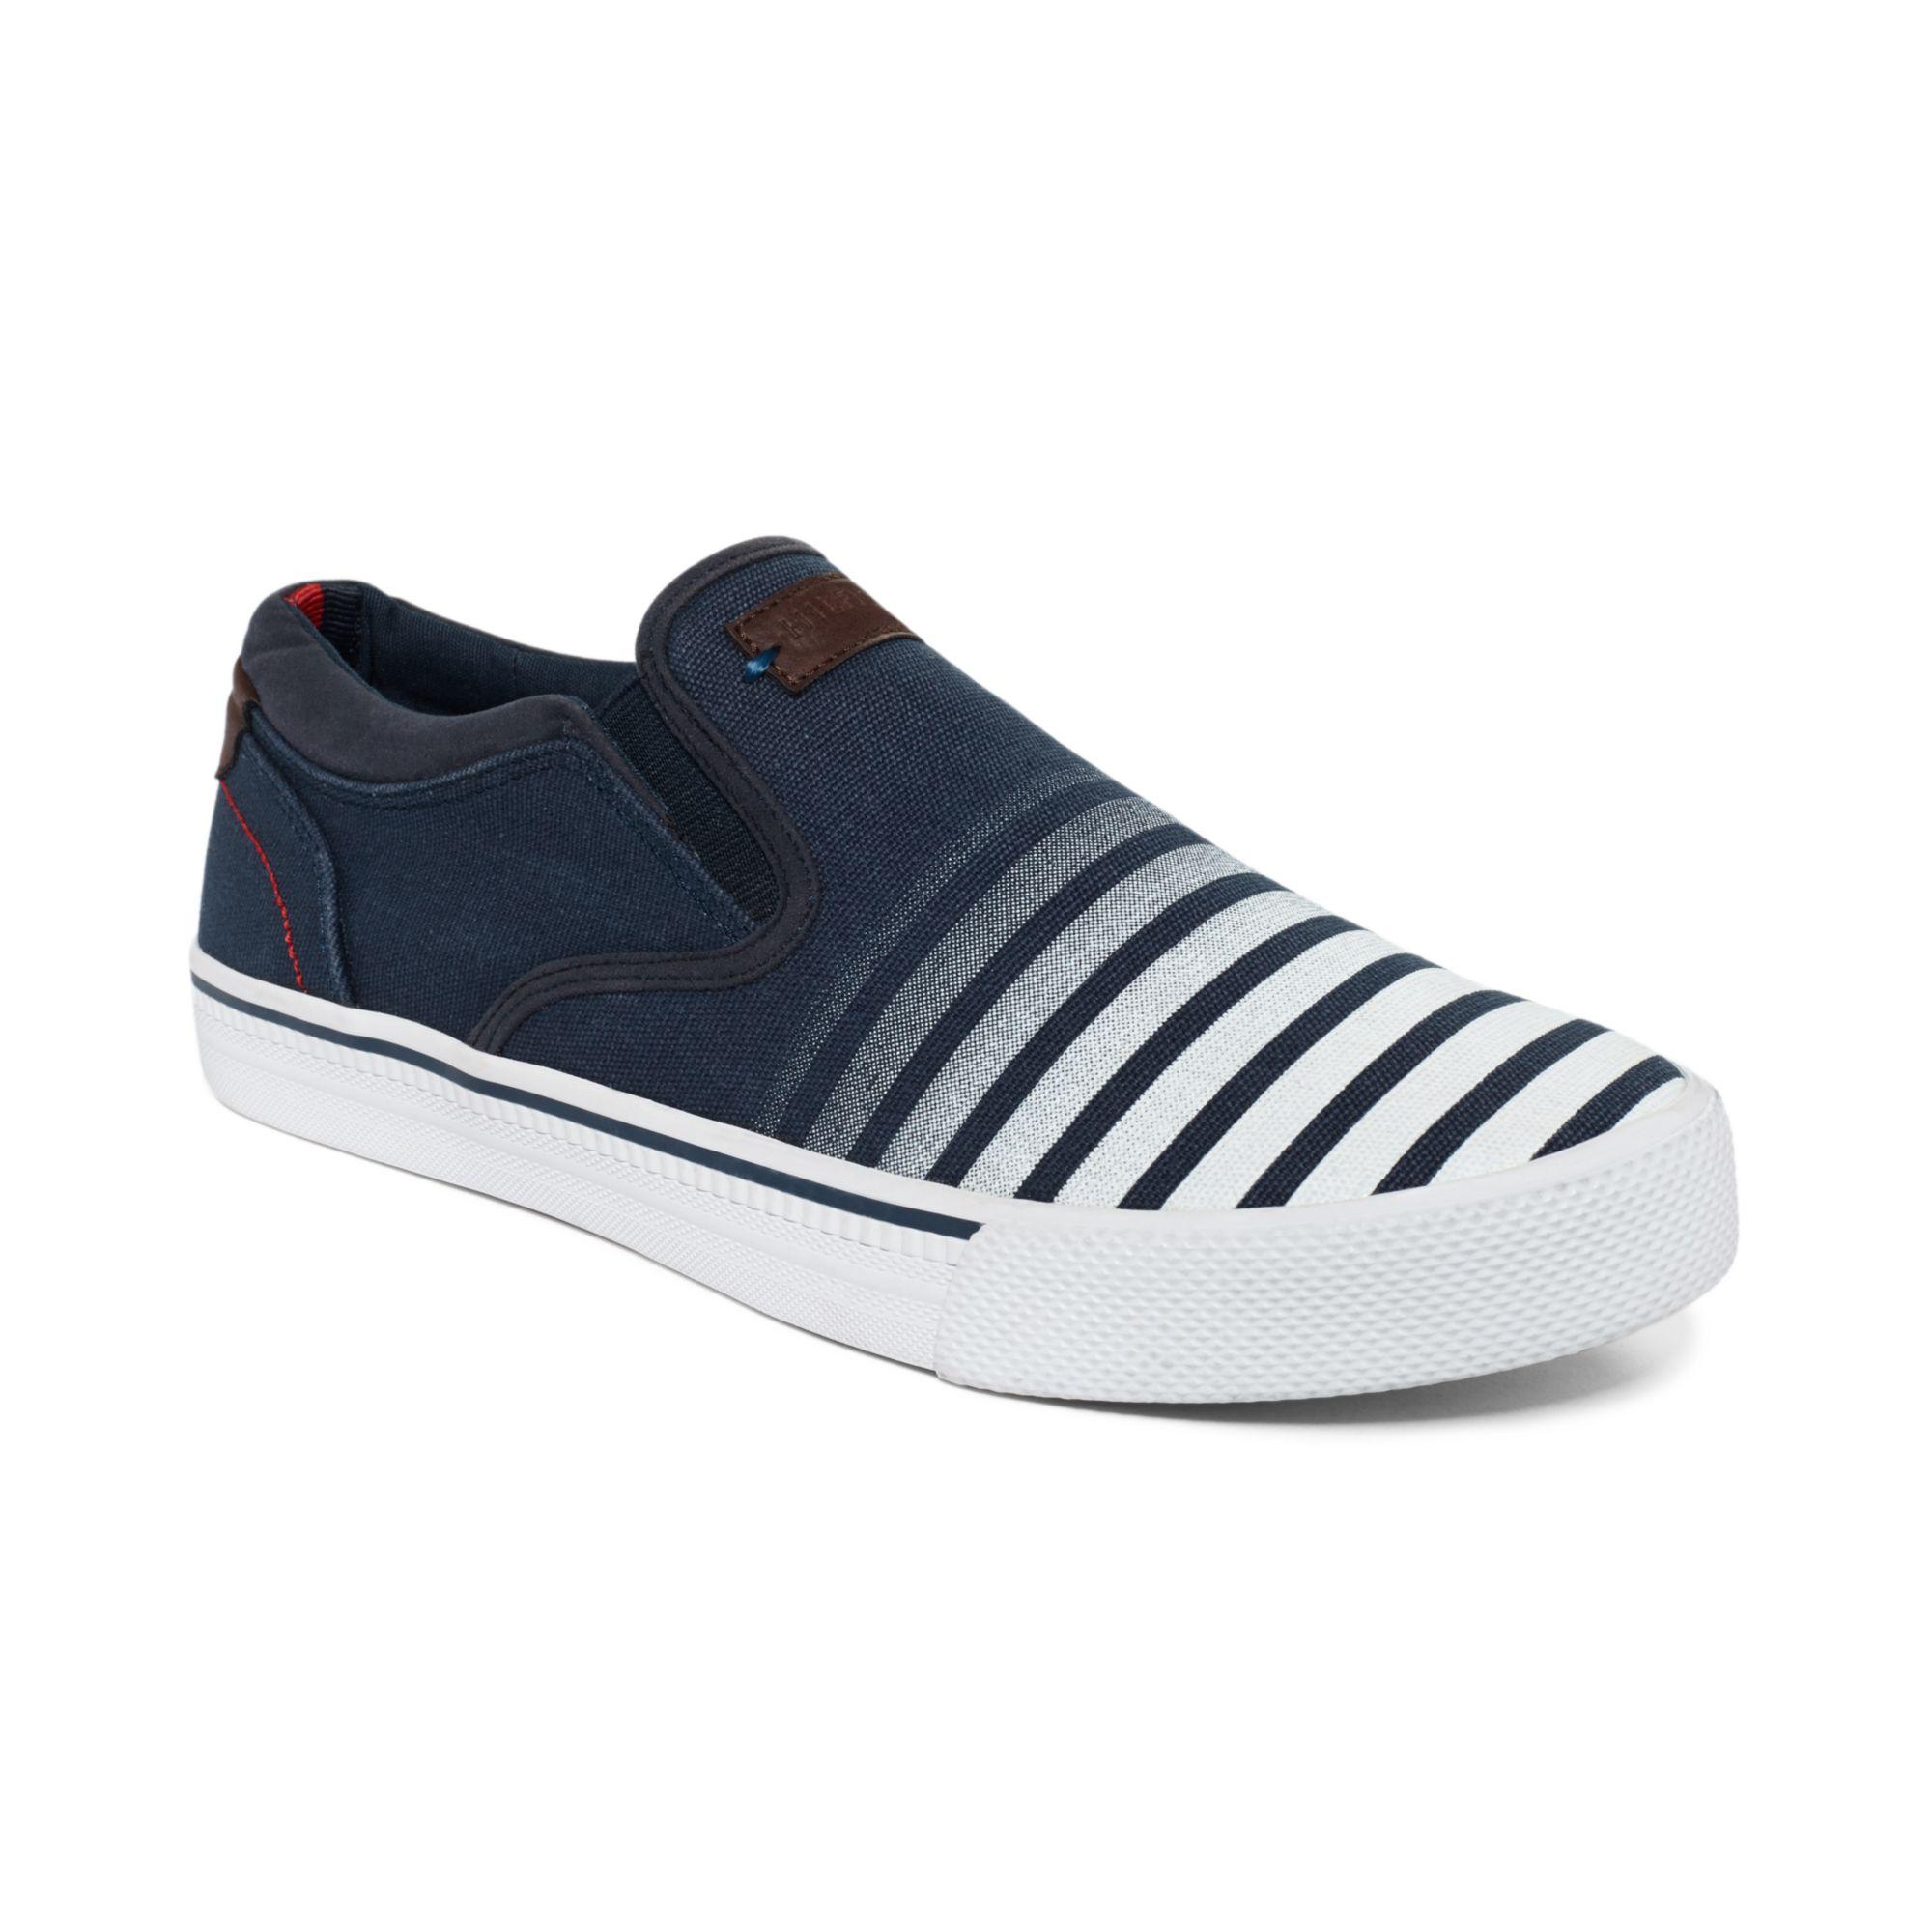 Lyst Tommy Hilfiger Rawley Slipon Sneakers In Blue For Men